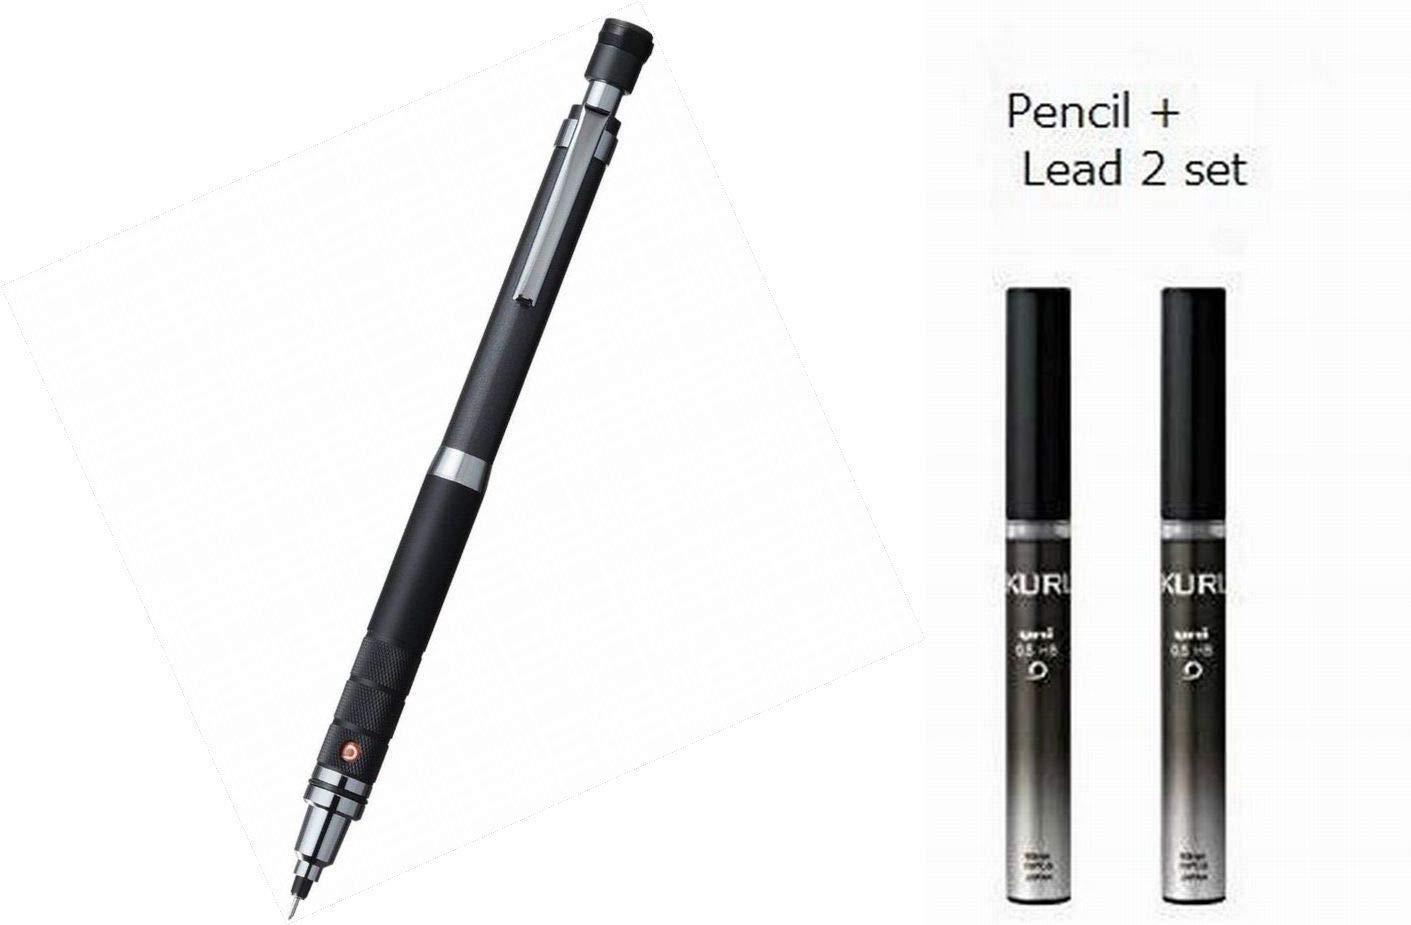 Uni Mechanical Pencil Kuru Toga Roulette Model...